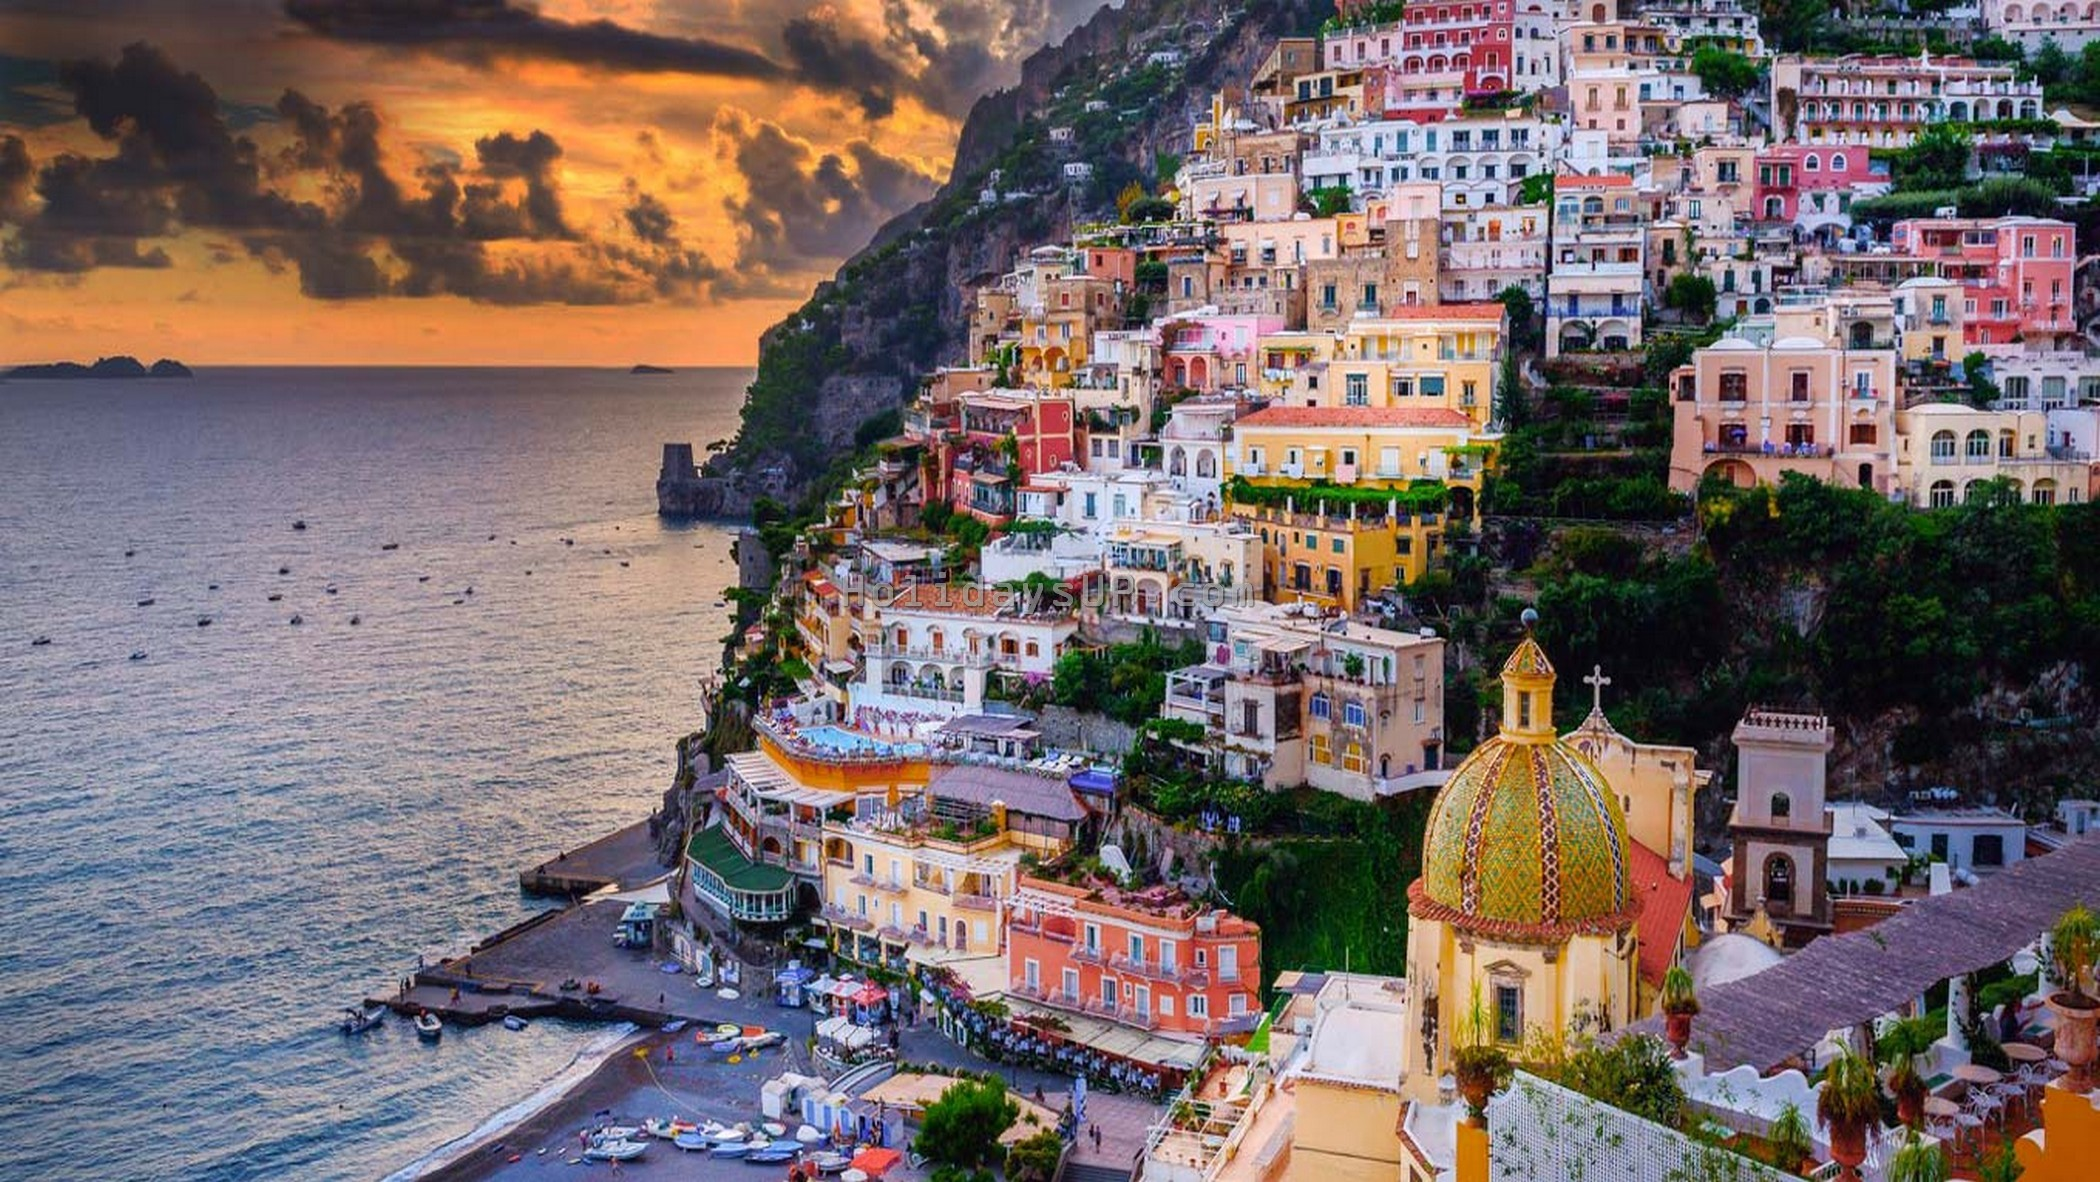 Positano - Amalfi Coast